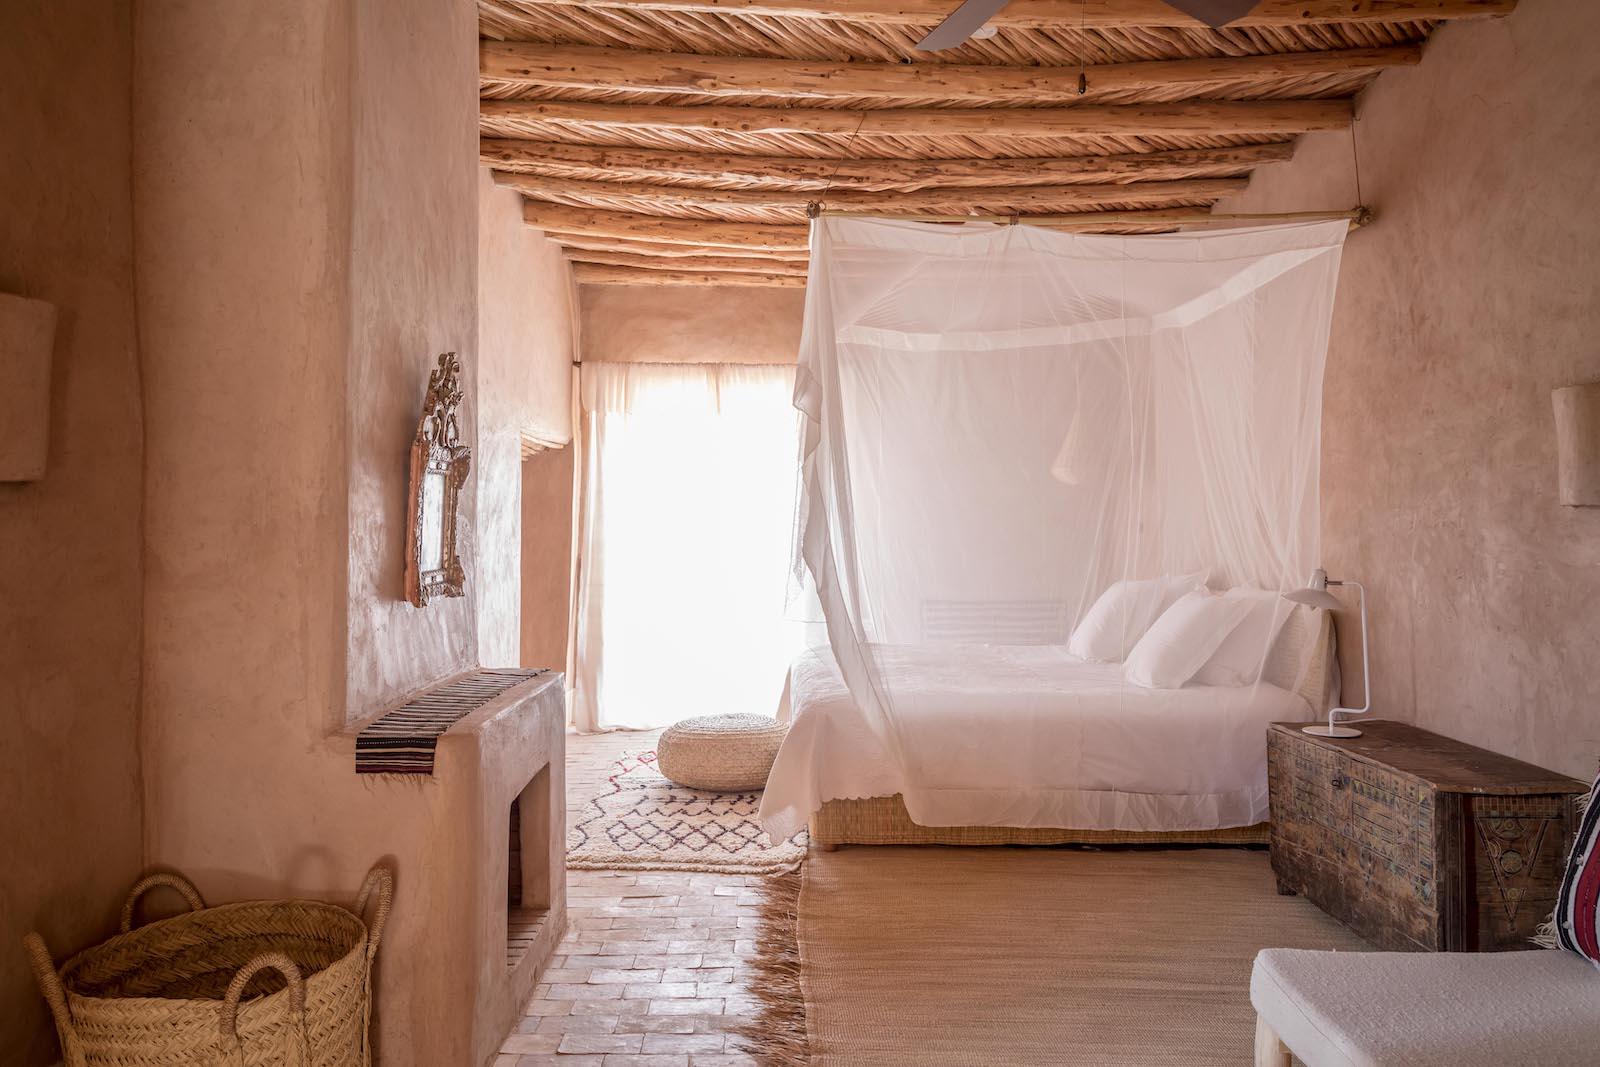 Berber Lodge (Photo Cecile Perrinet-Lhermitte)